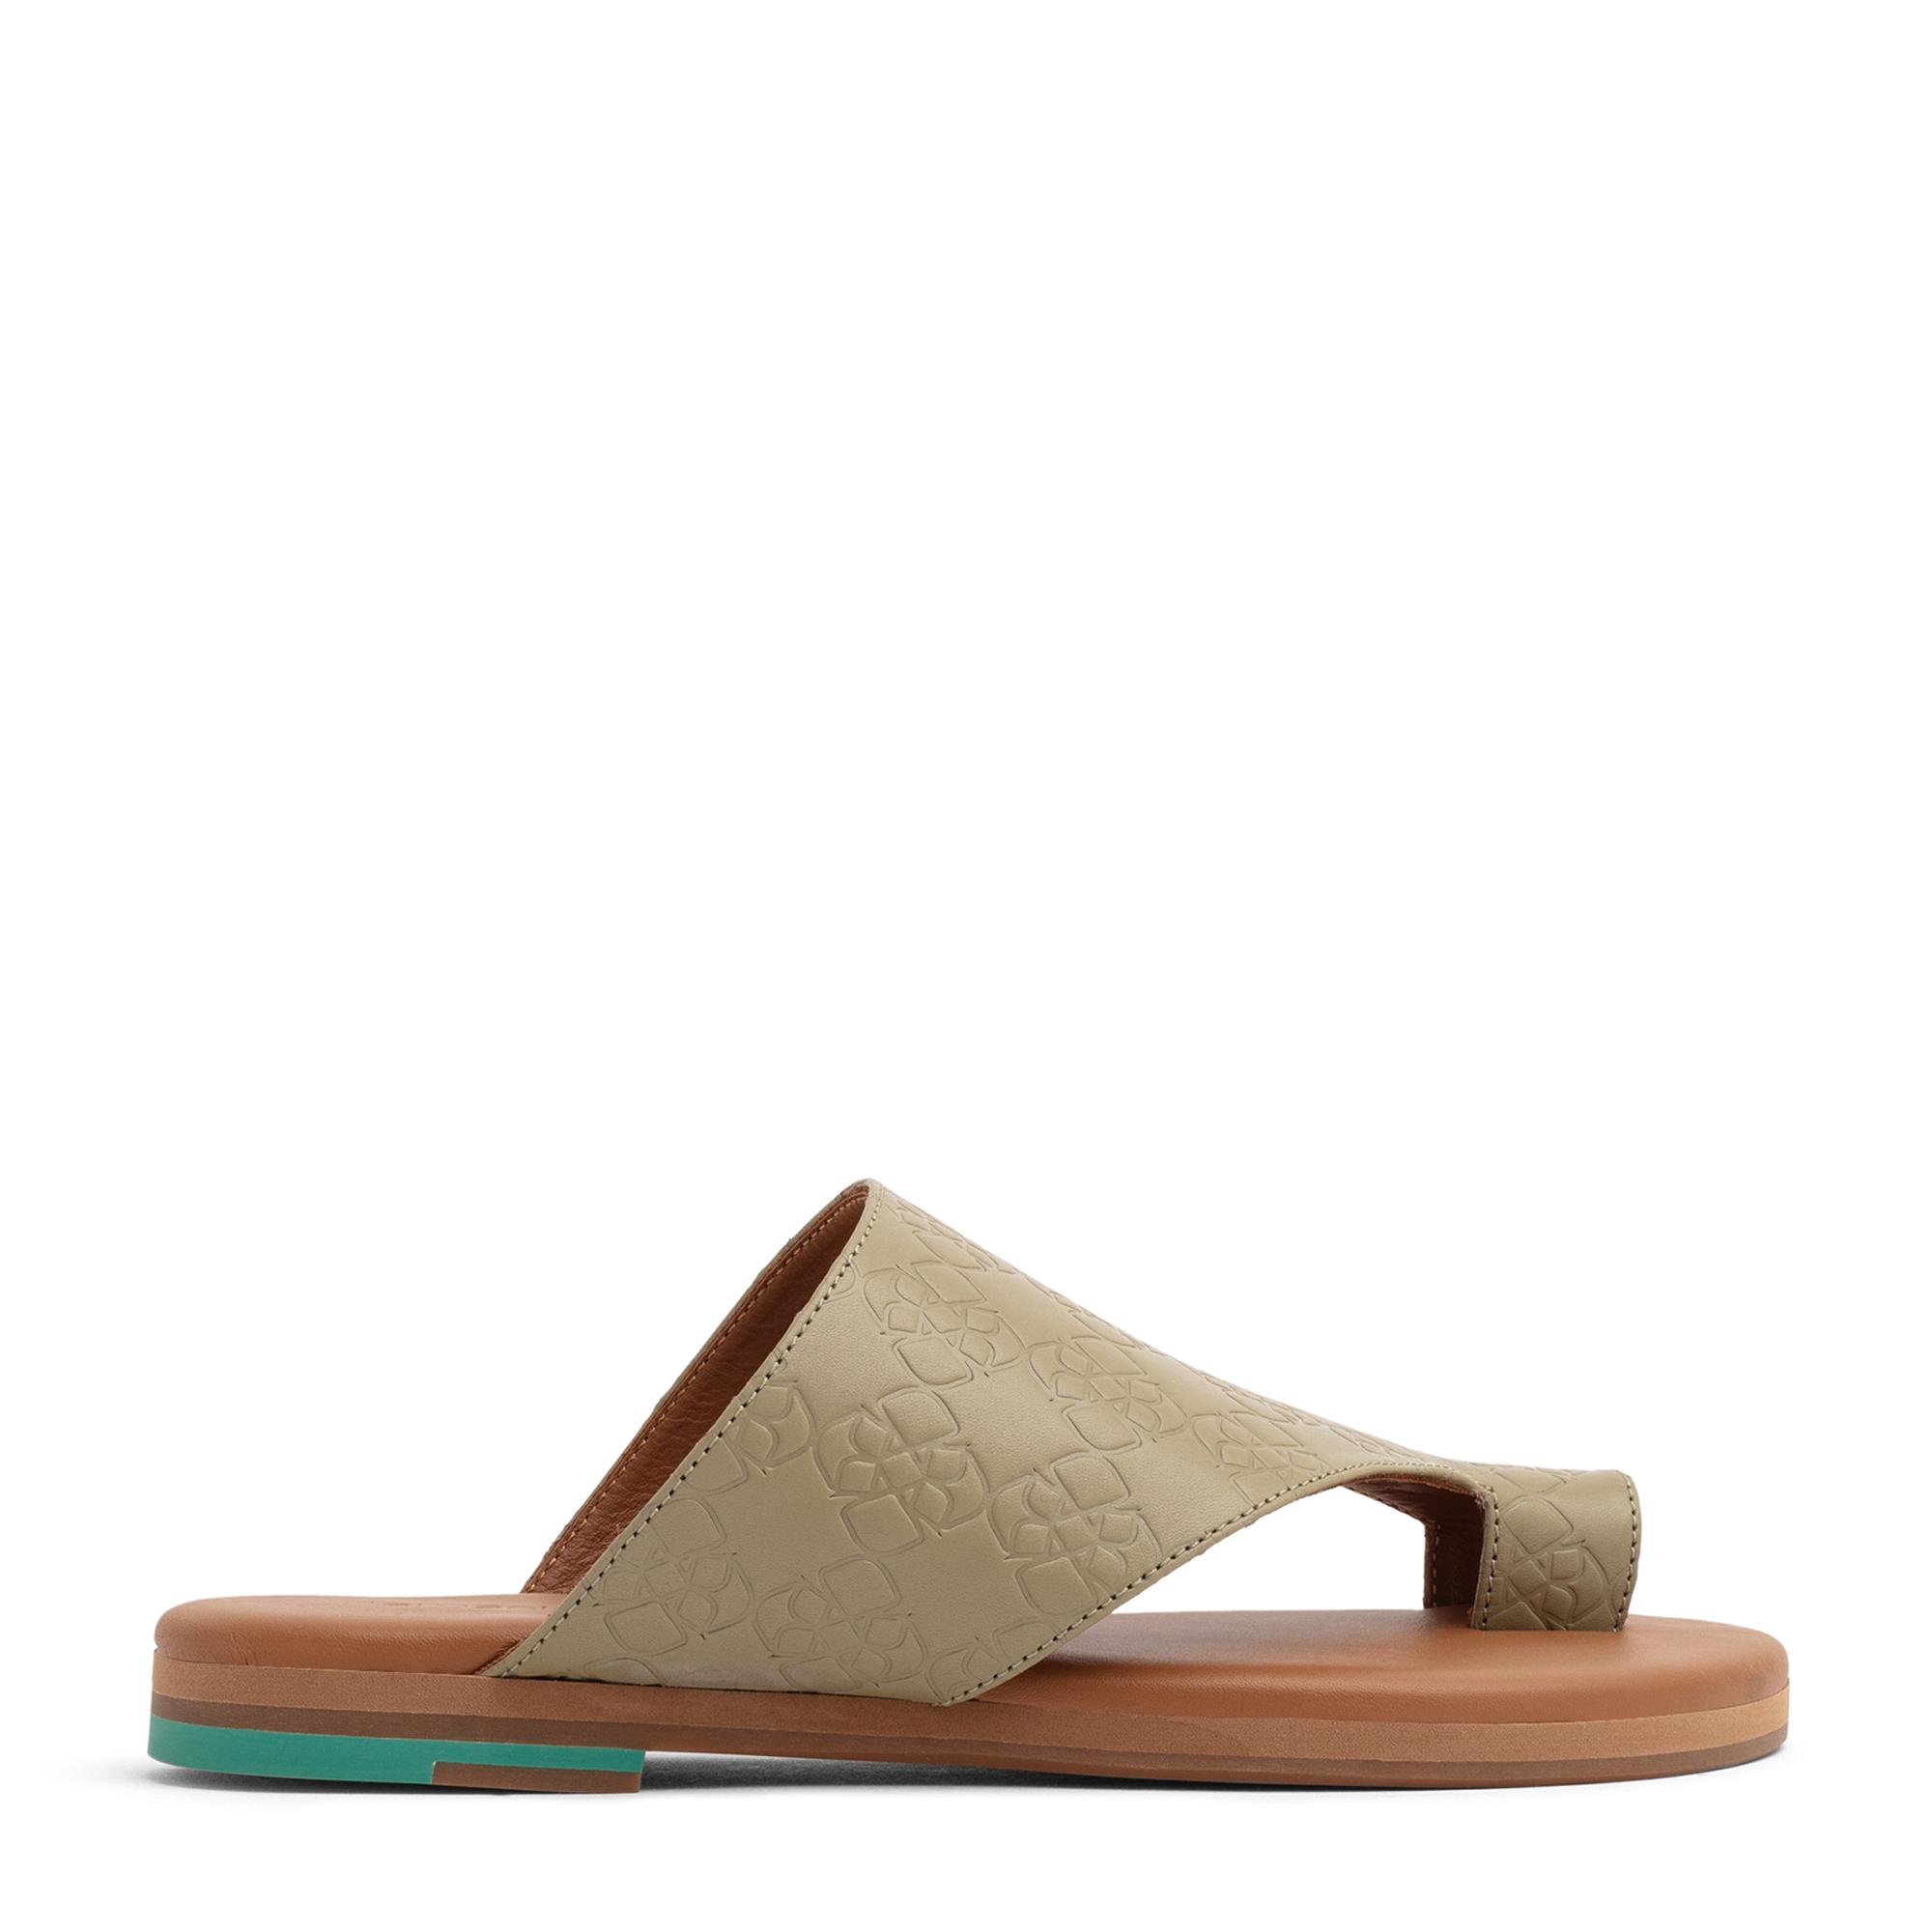 Goloh sandals